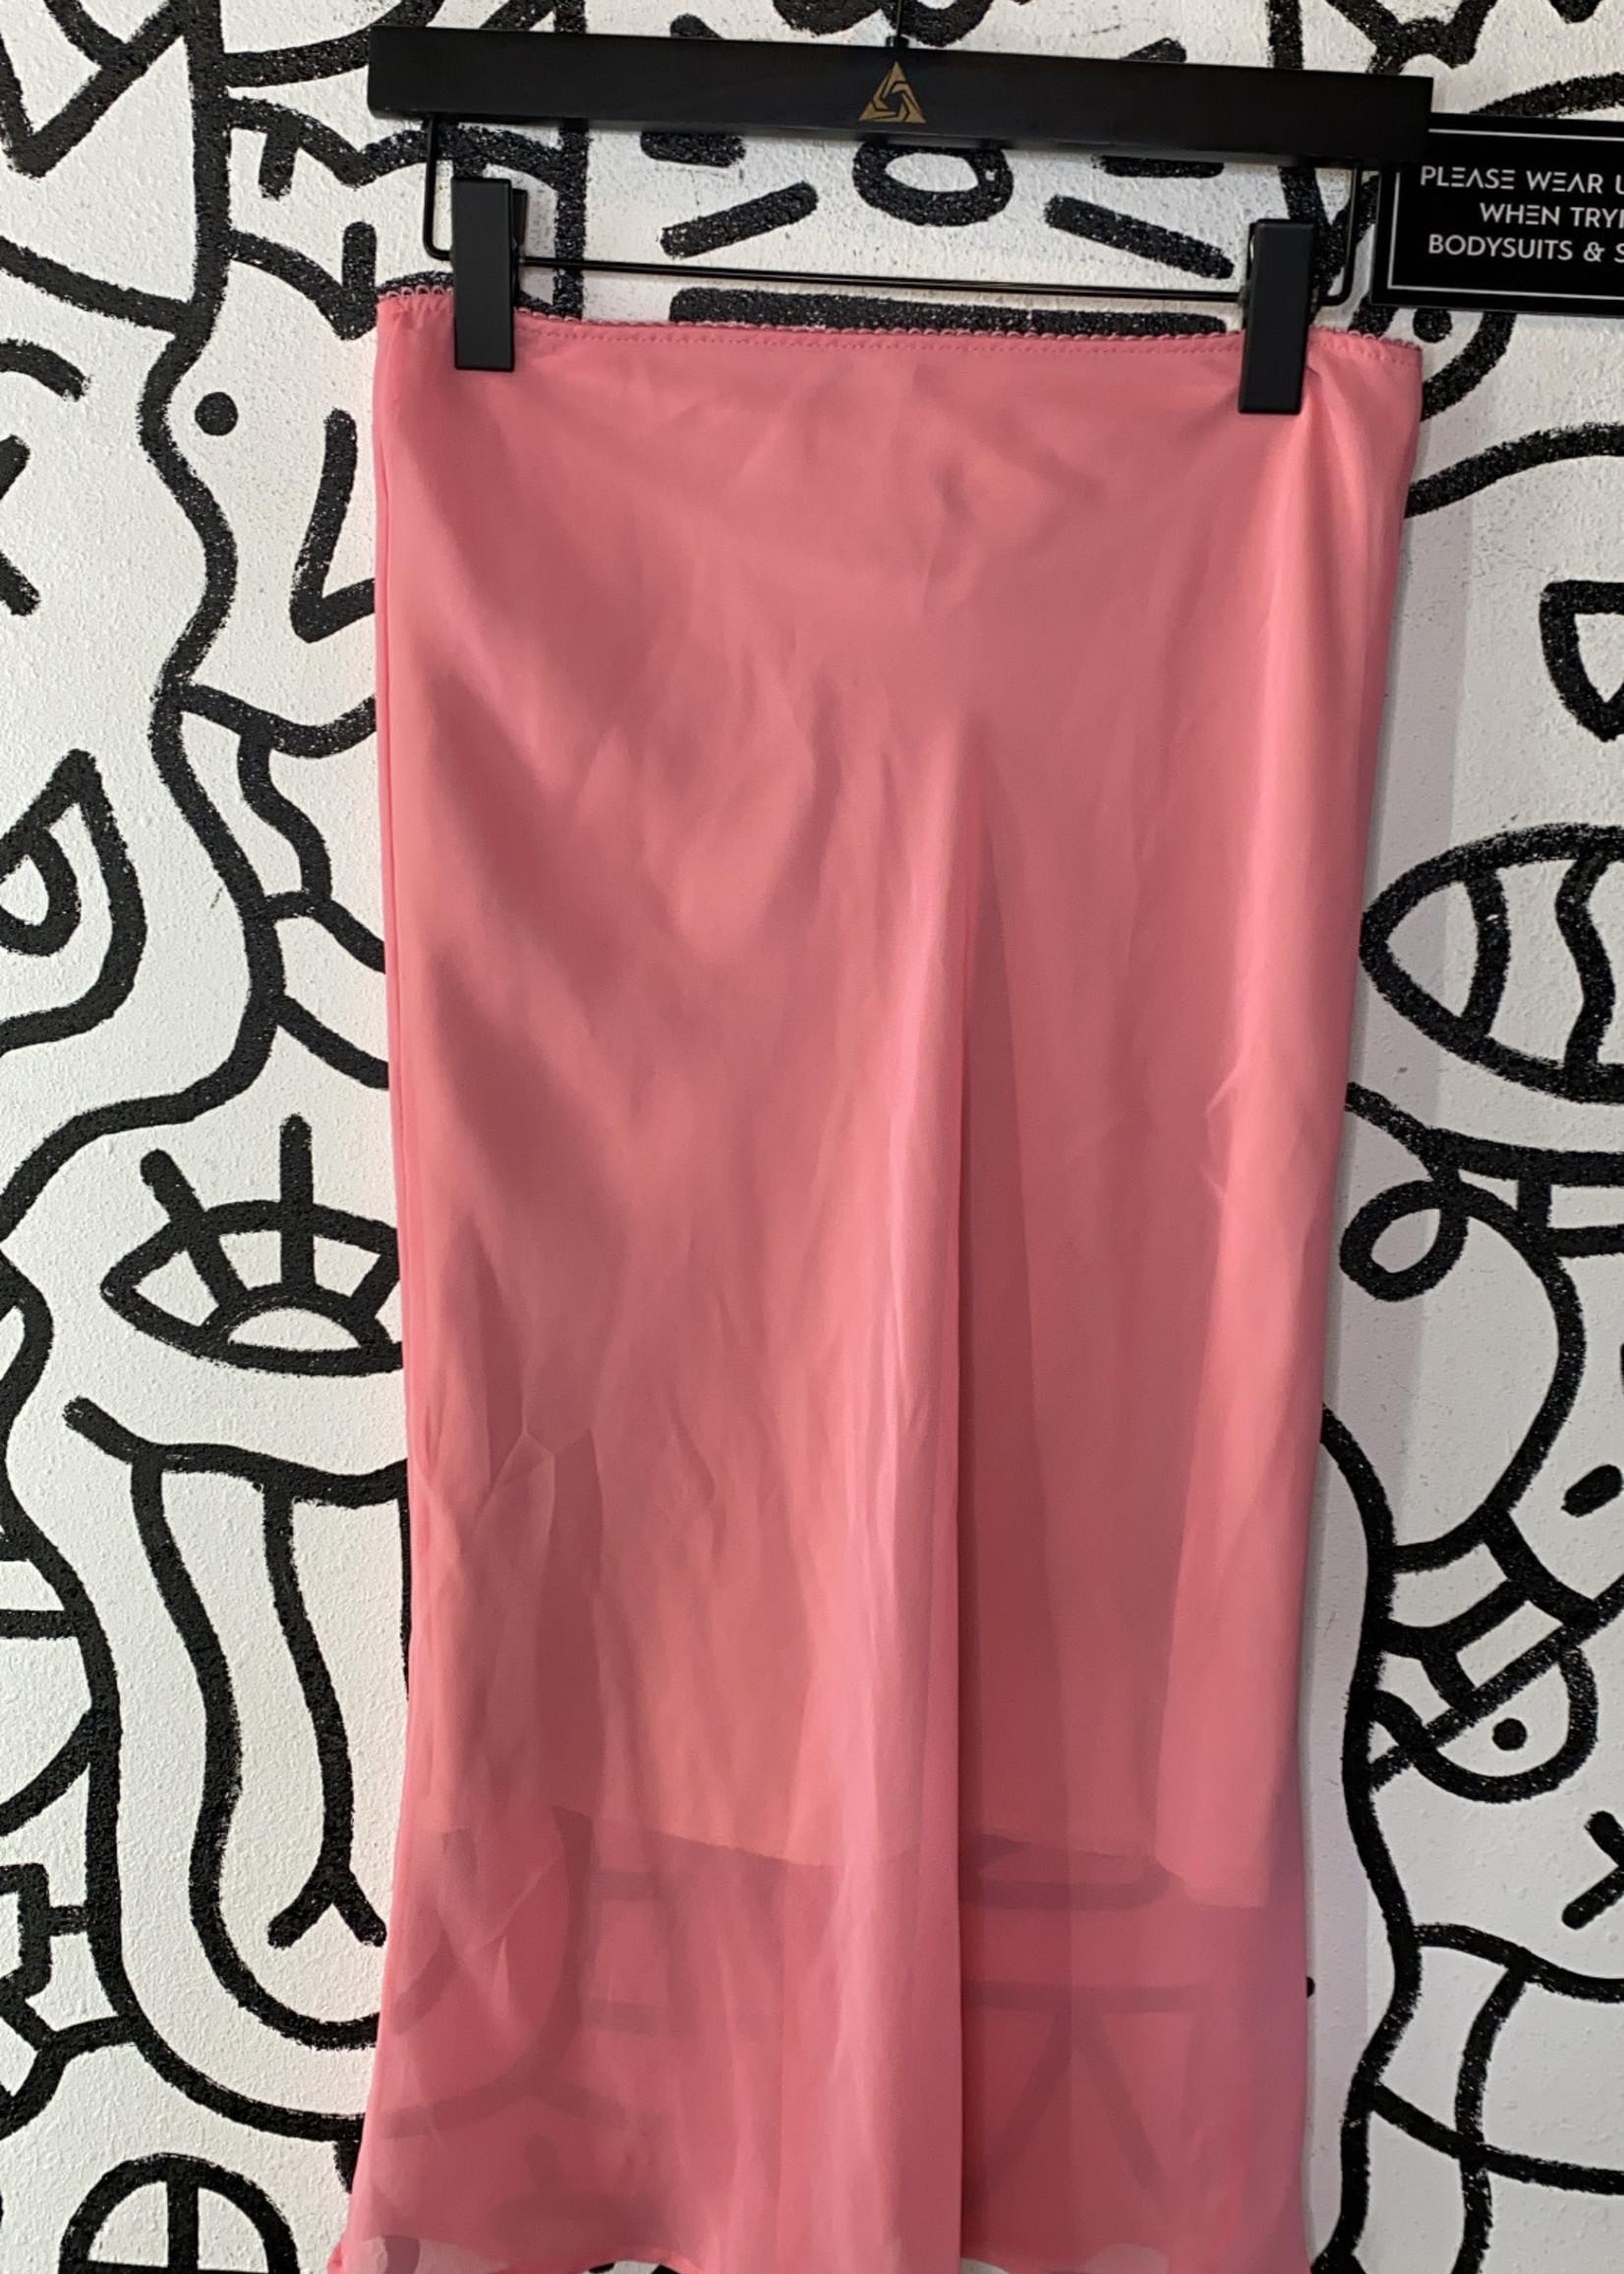 Vintage Baby pink mid sheer skirt S